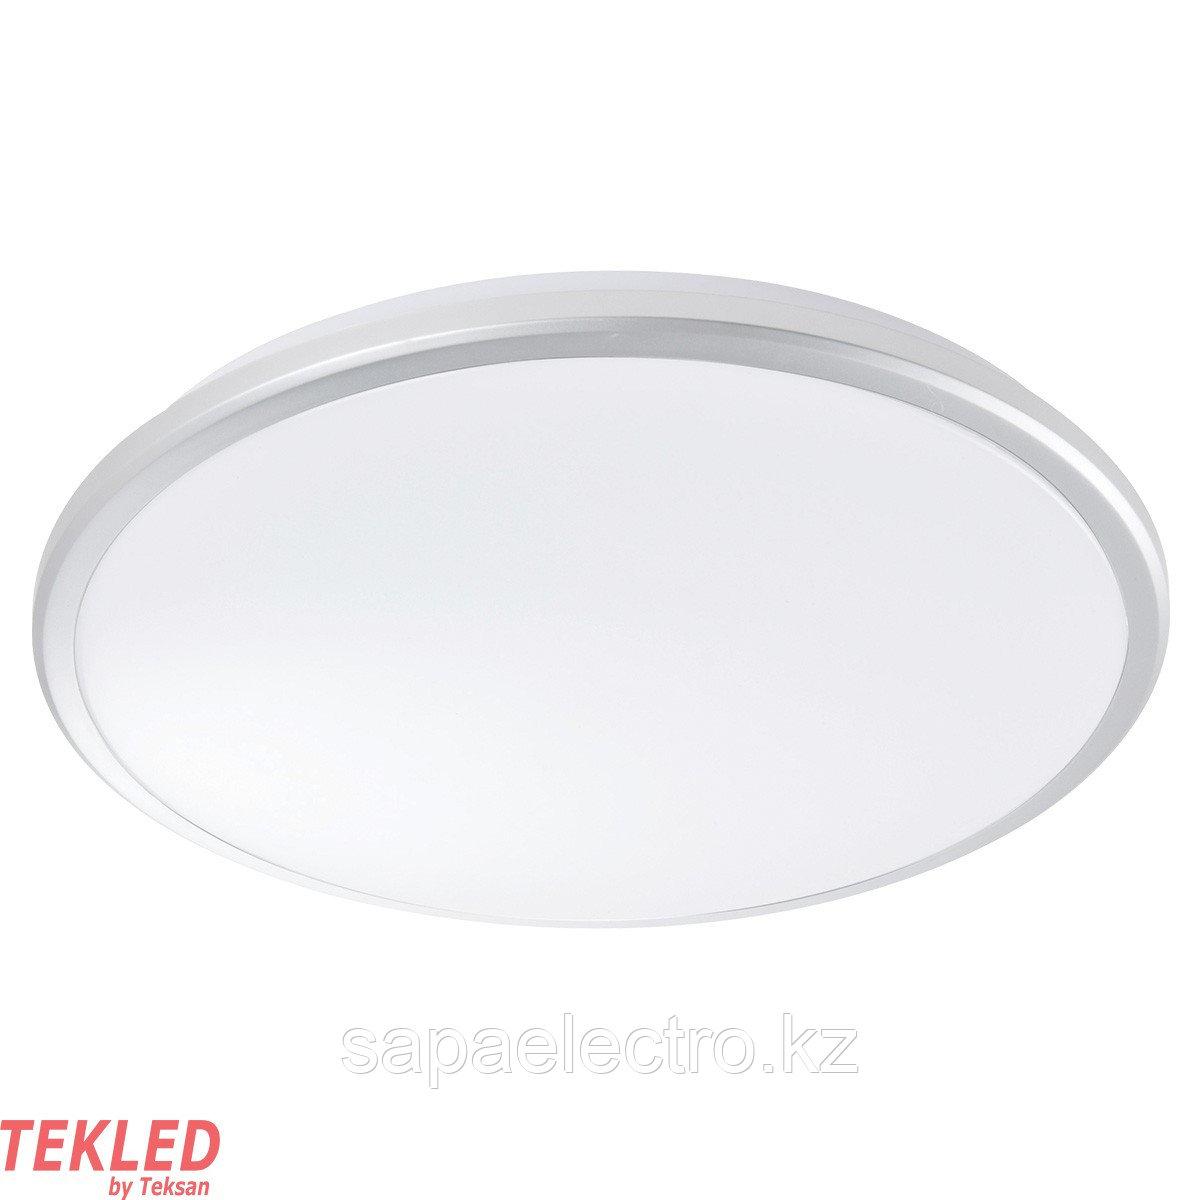 Свет-к RONDO LED 30W 6000K   (TEKSAN) 8шт